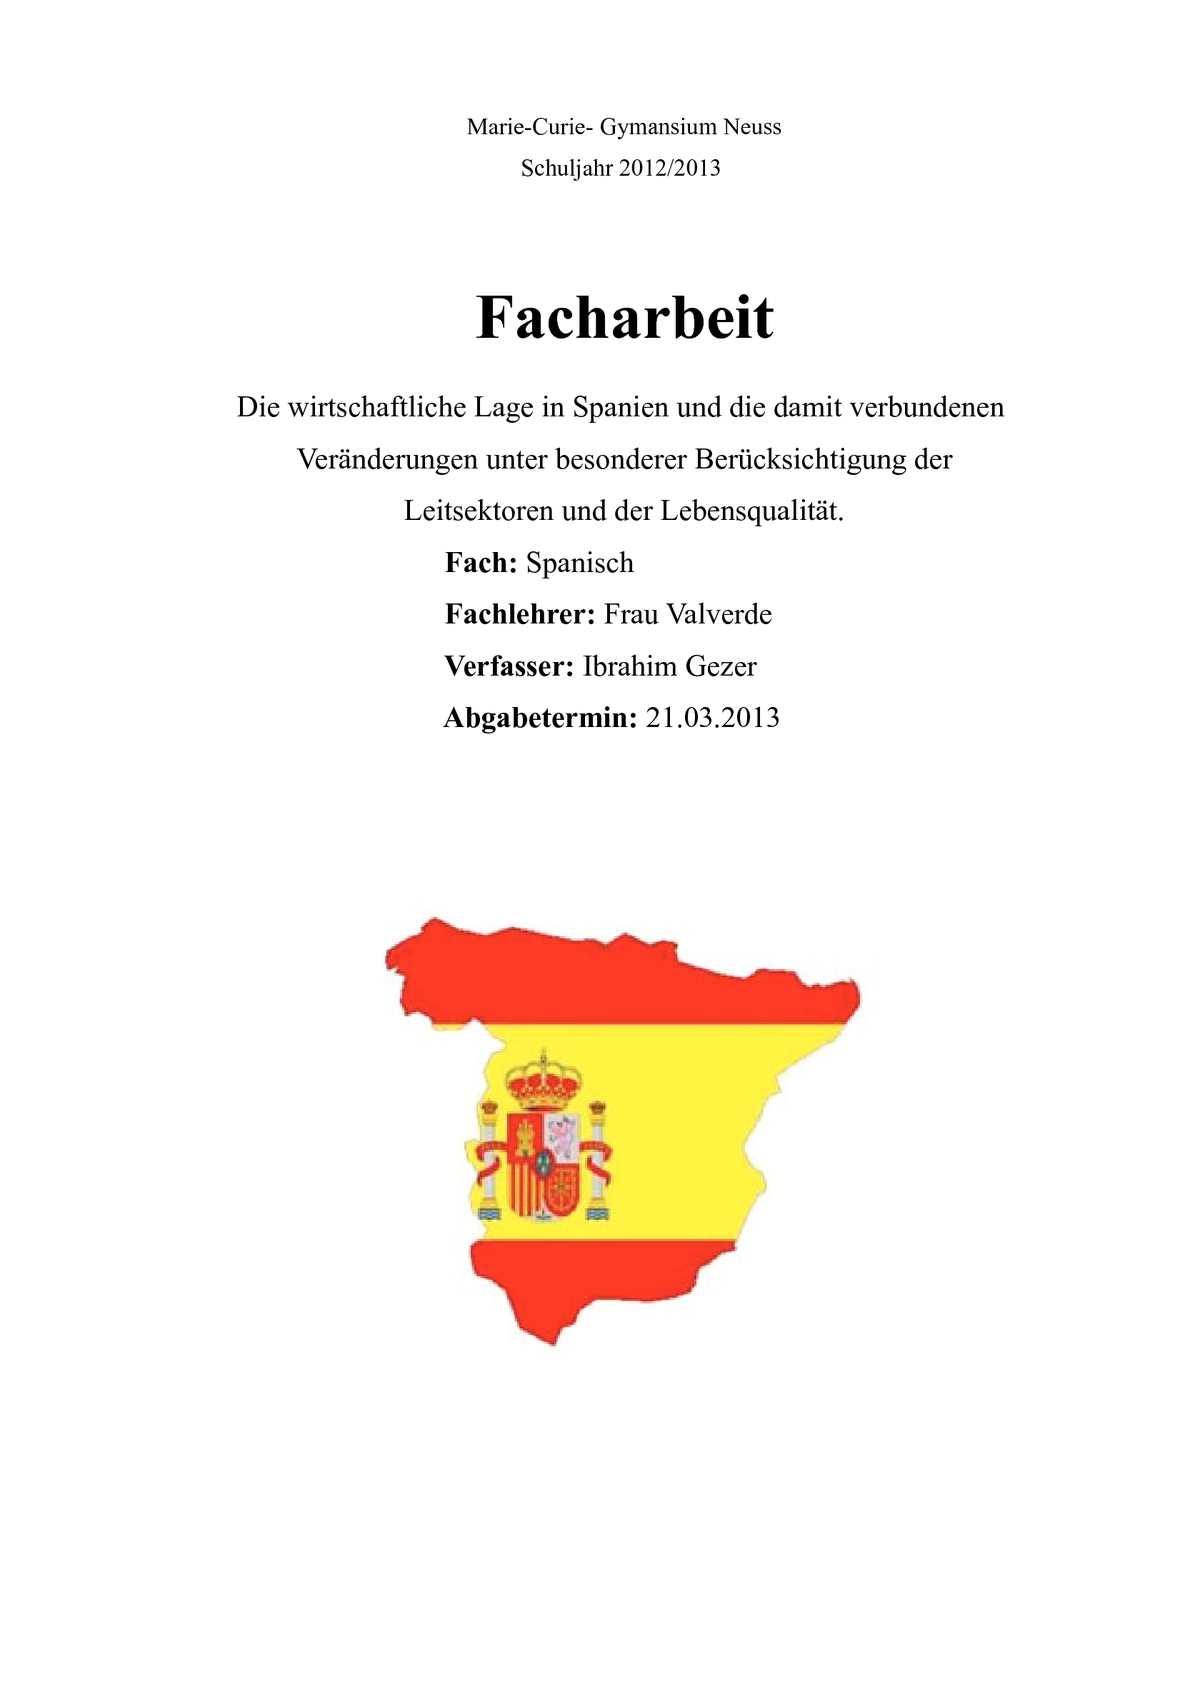 calamo facharbeit spanisch - Facharbeit Muster